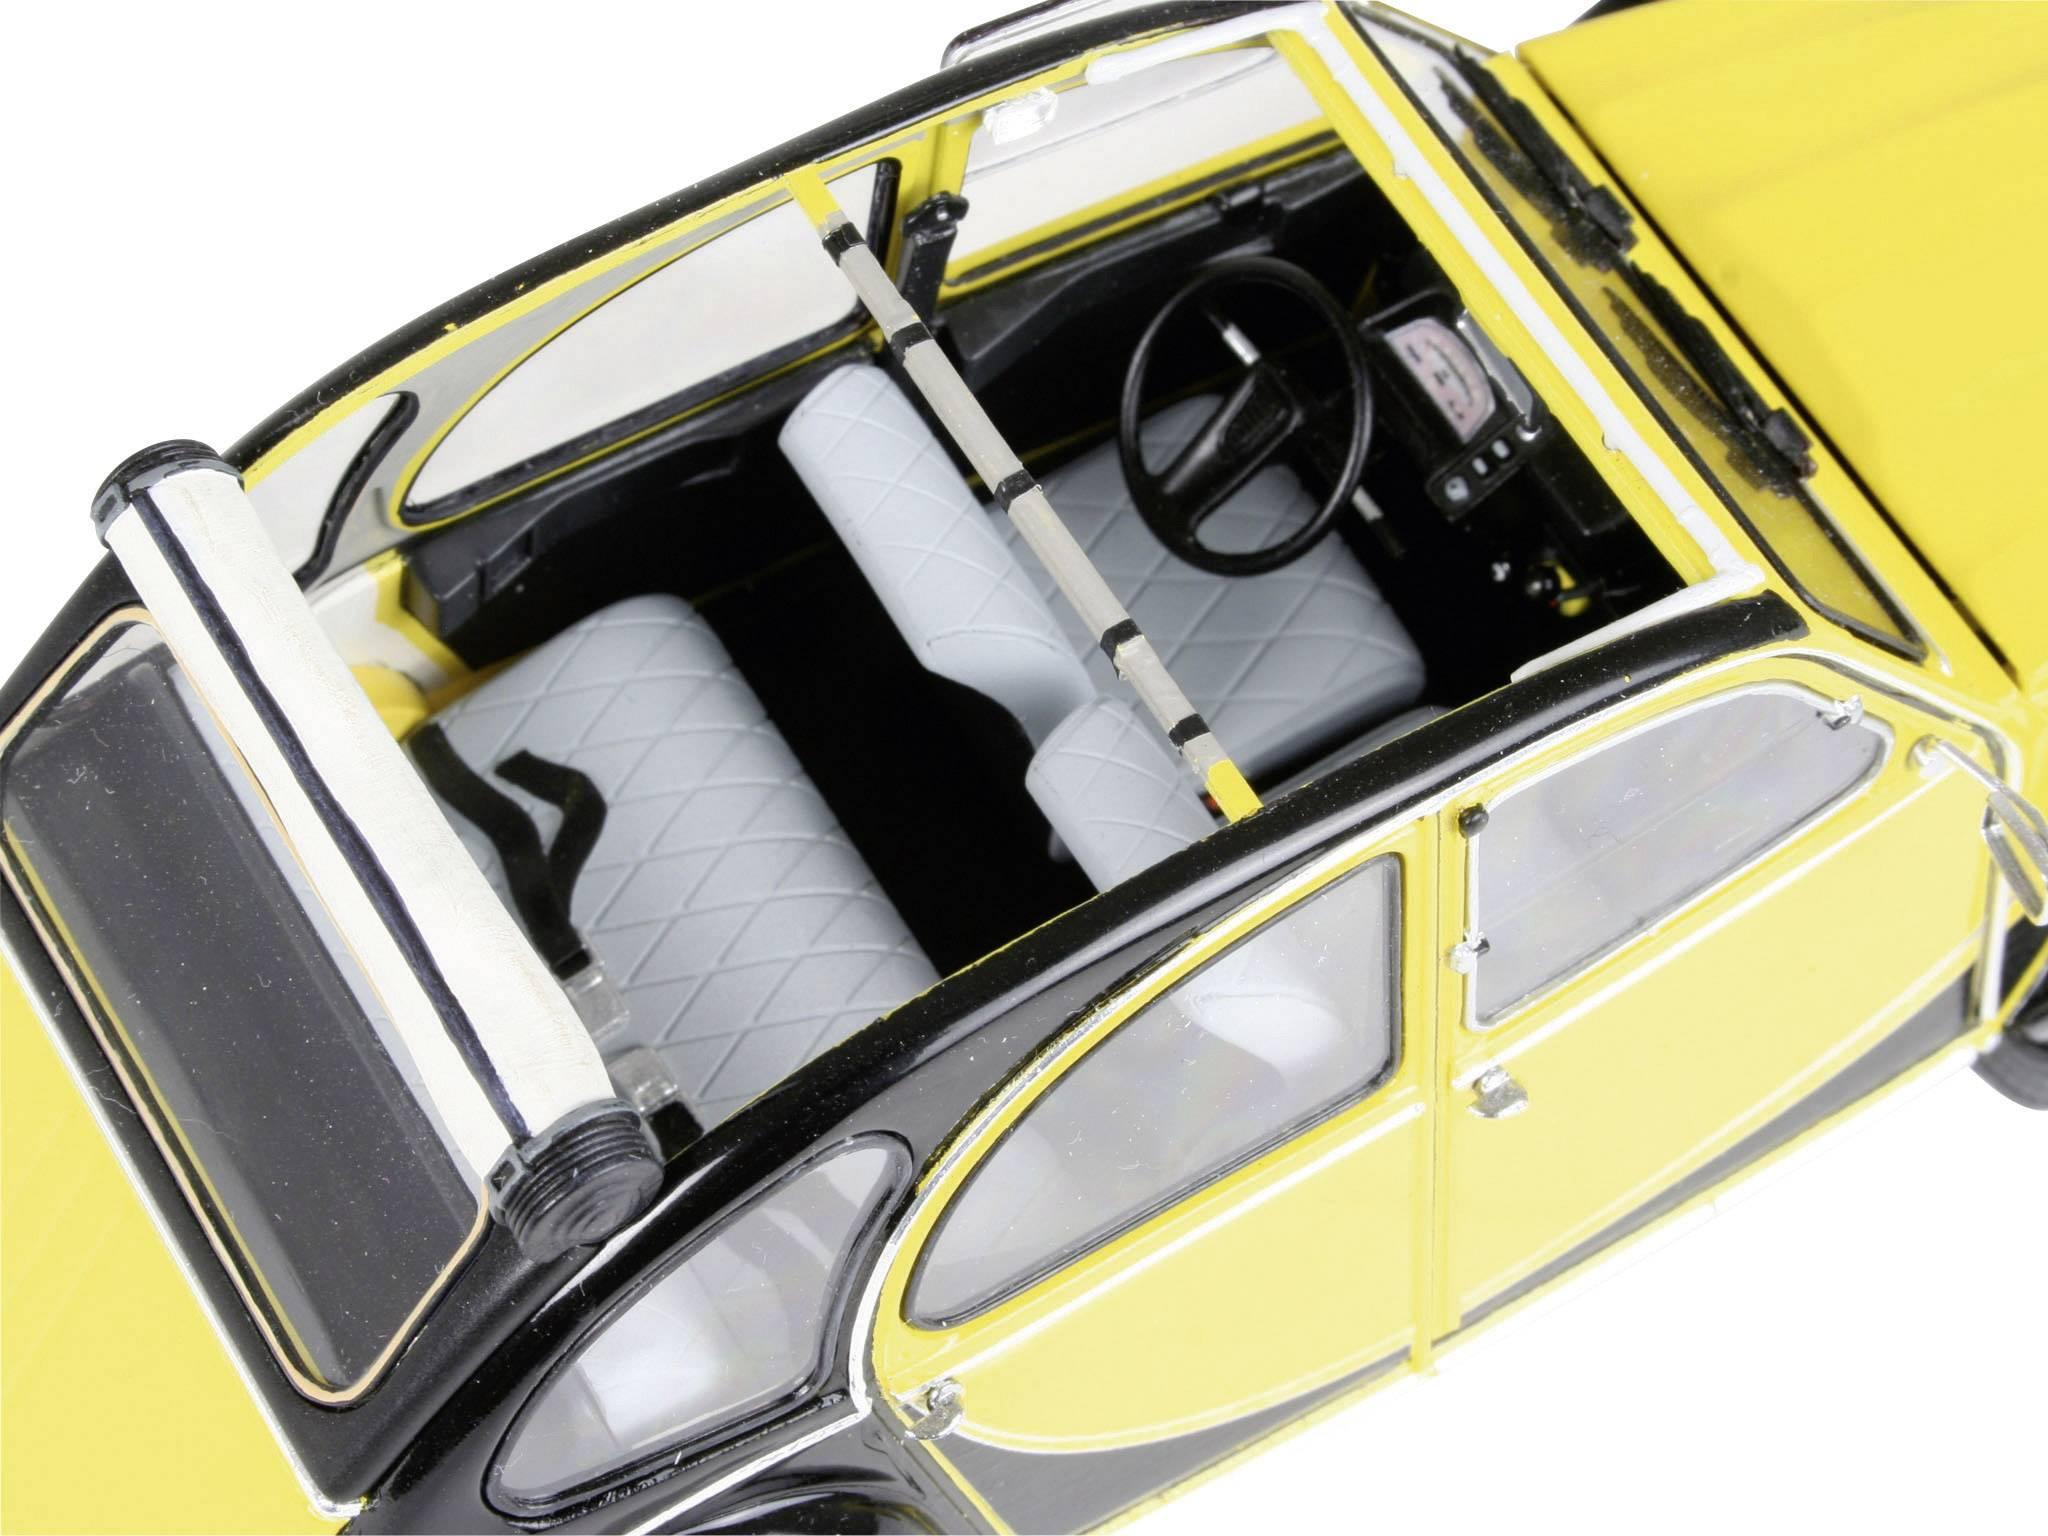 2cv Maquette Voiture Citroen Charleston Revell De 07095 24 1 4A5RL3j